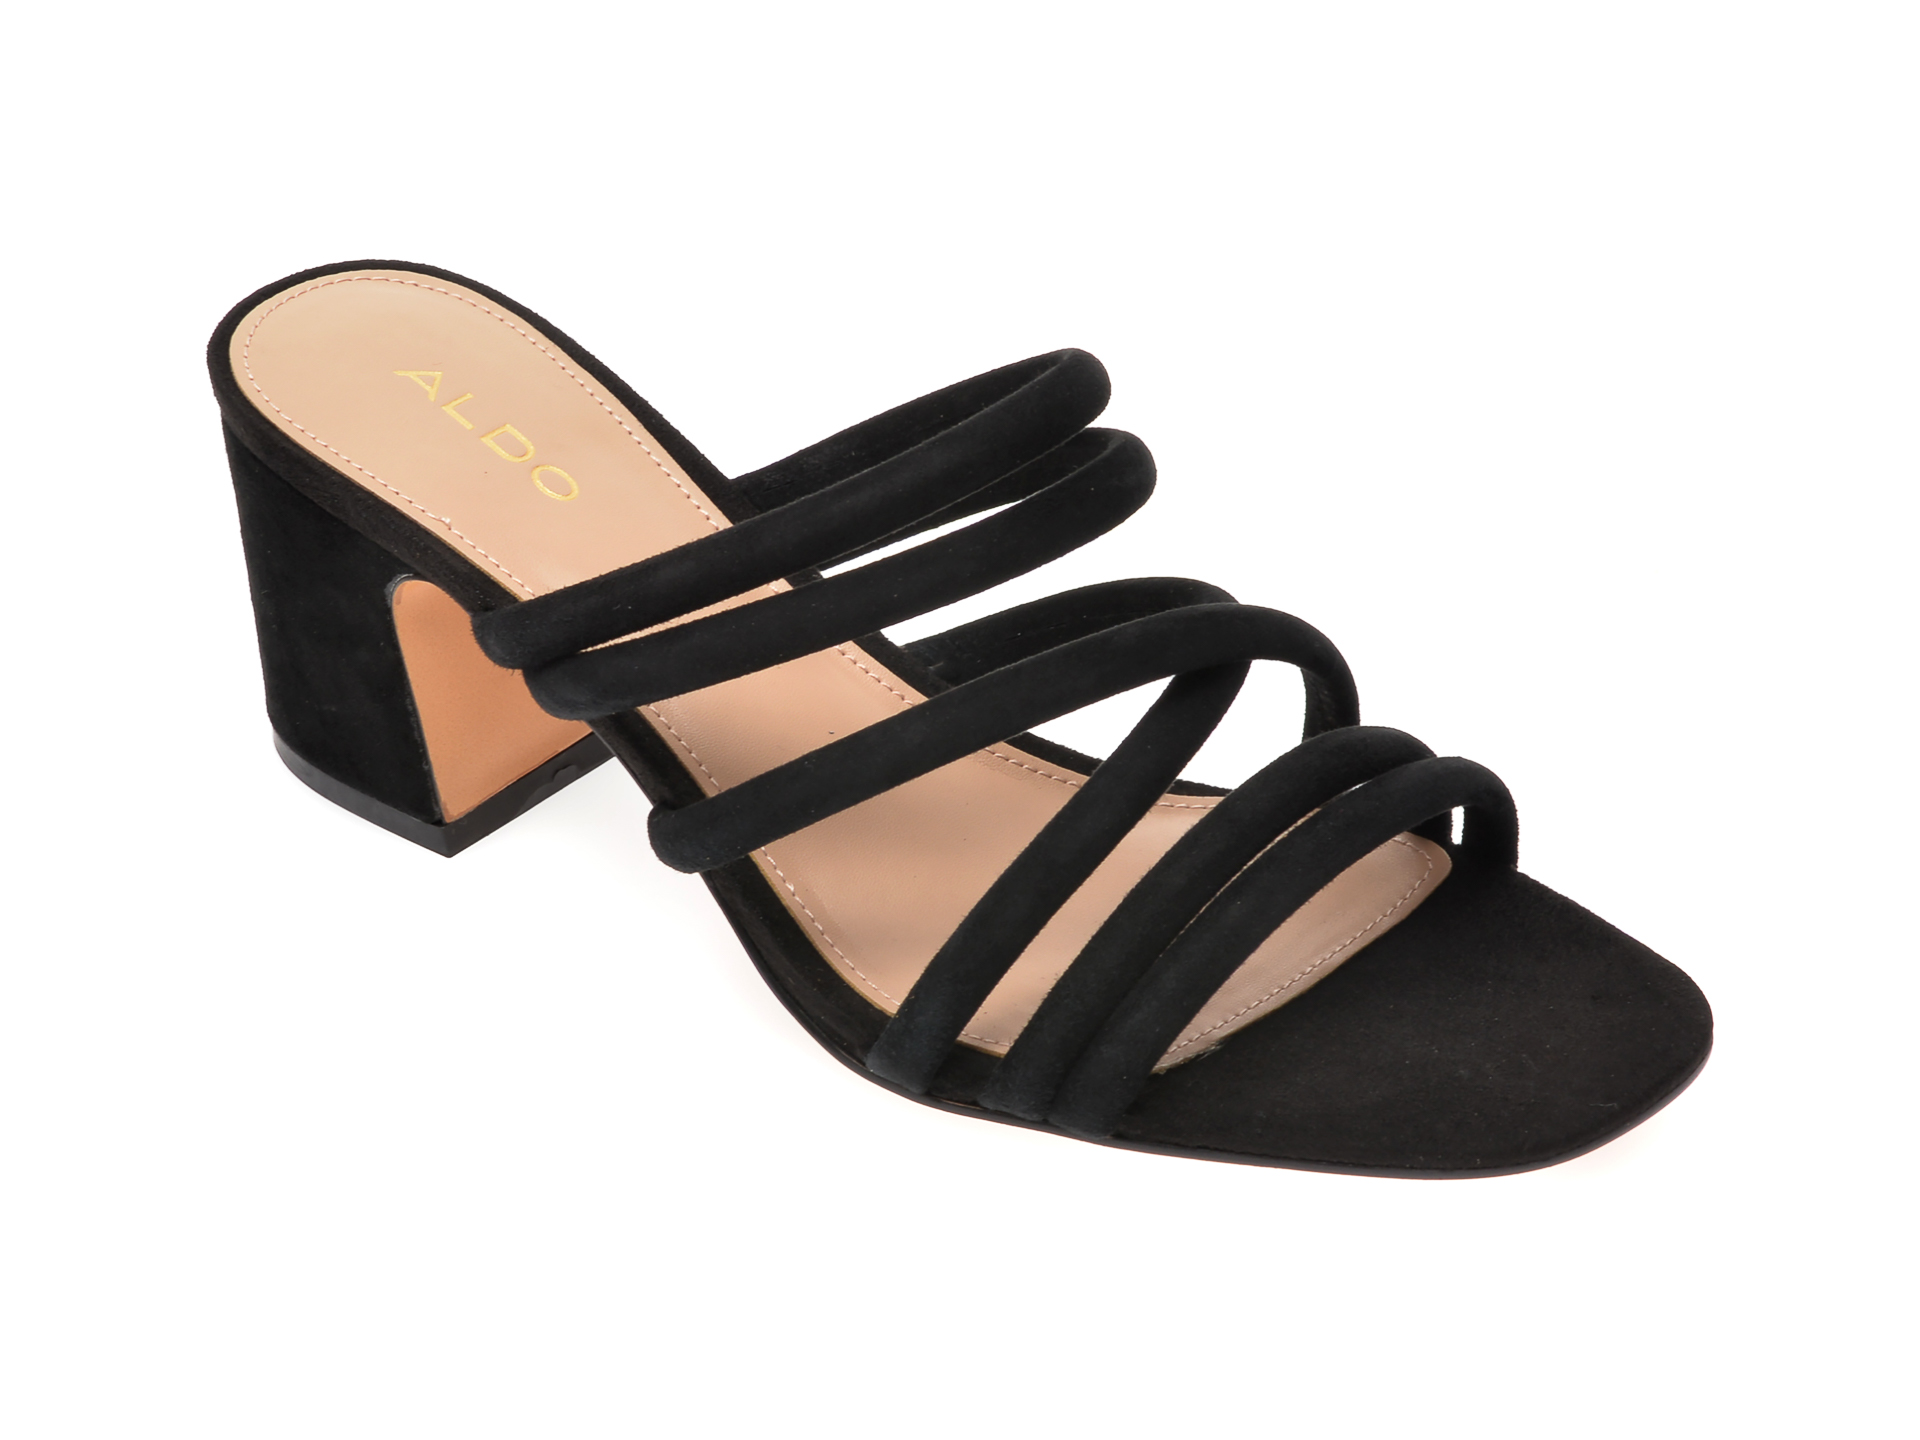 Sandale ALDO negre, Atlanta001, din piele intoarsa imagine